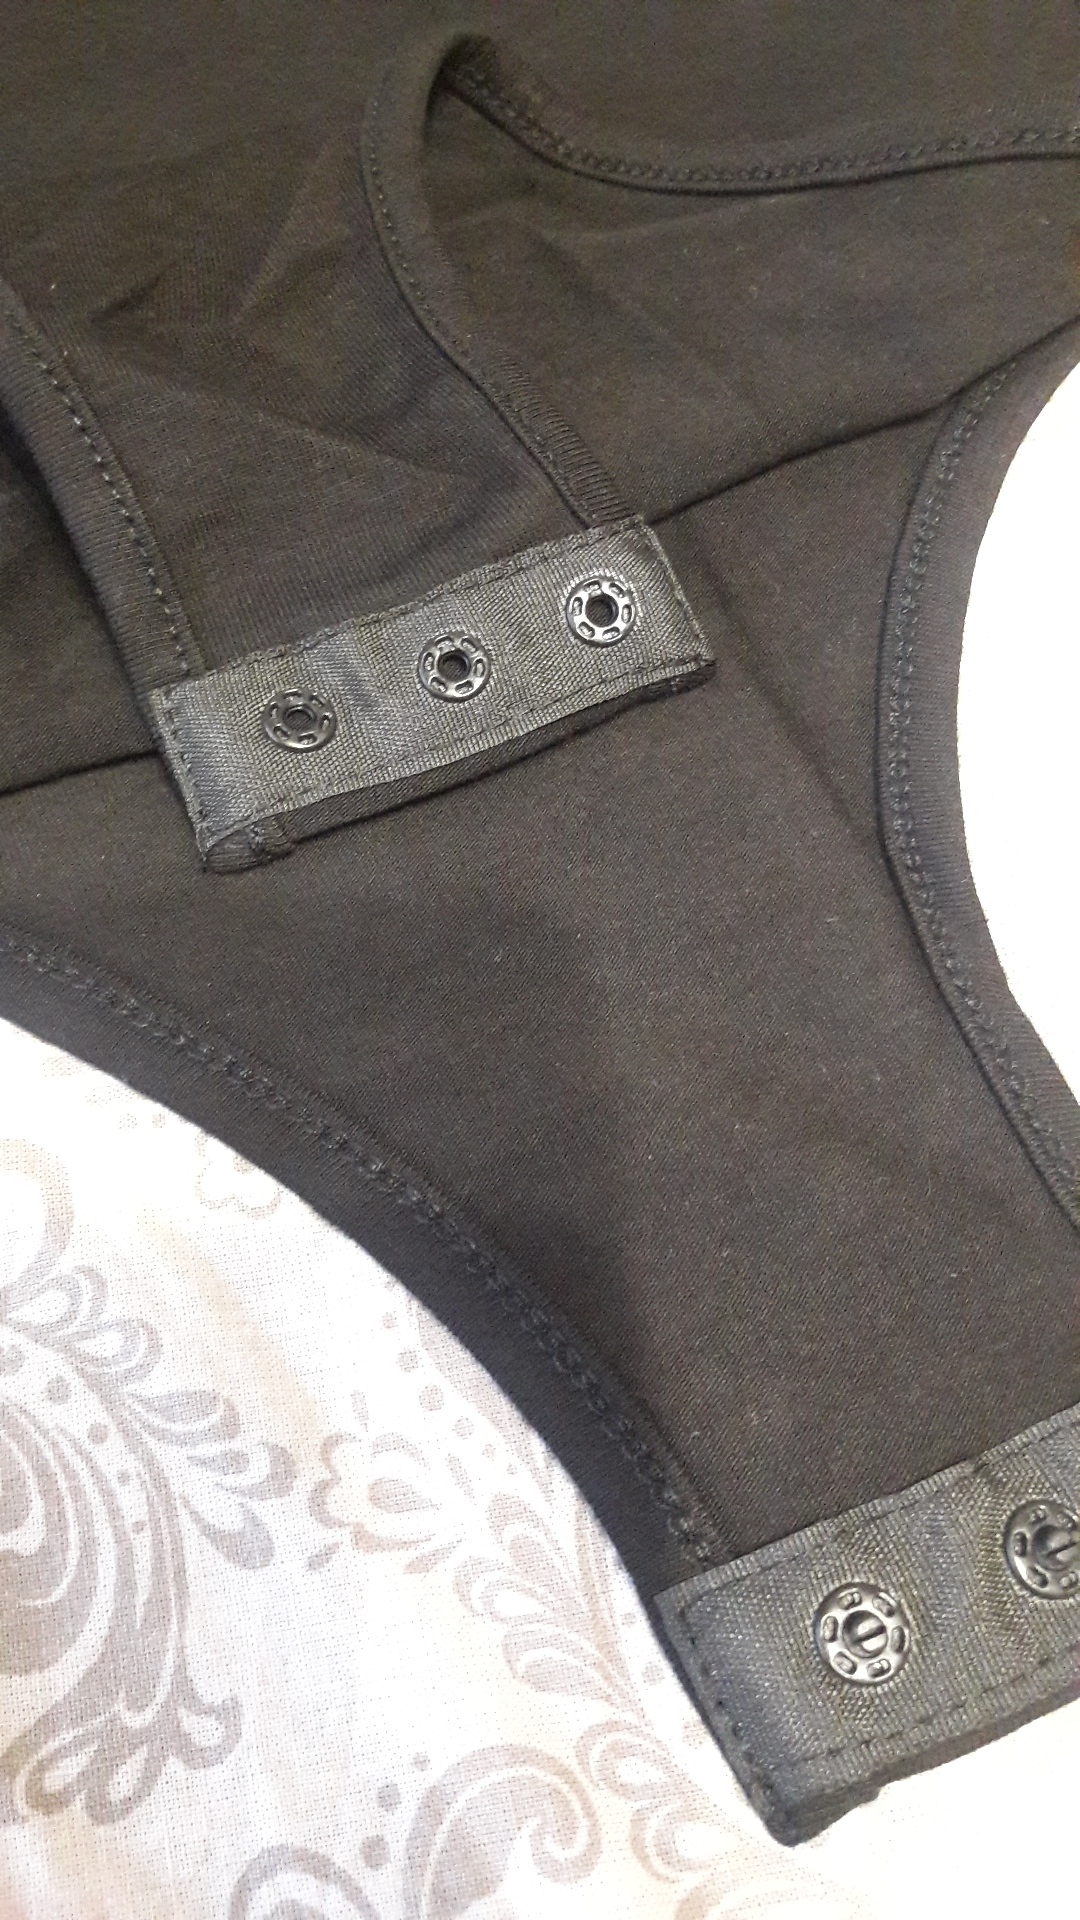 Hugcitar cotton halter one shoulder sexy bodysuit women new fashion 2019 winter spring solid bodycon casual long sleeve body|Bodysuits|   - AliExpress